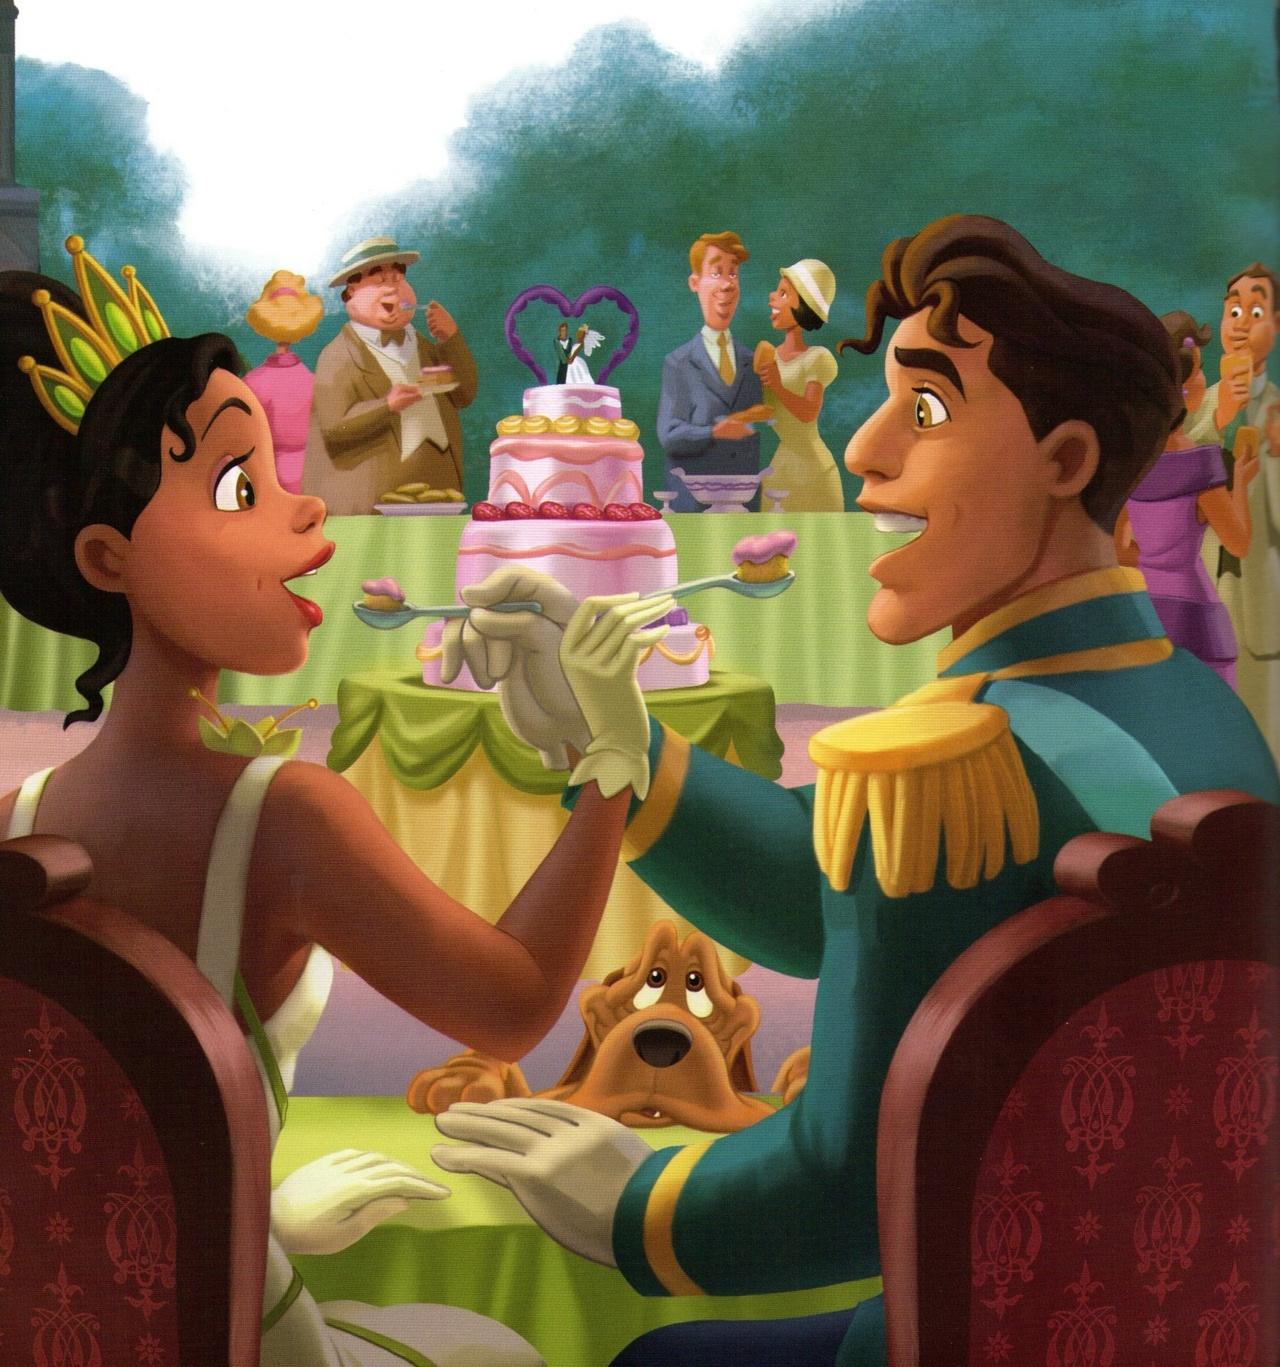 Tiana and Naveen - Disney Princess Photo (32161028) - Fanpop